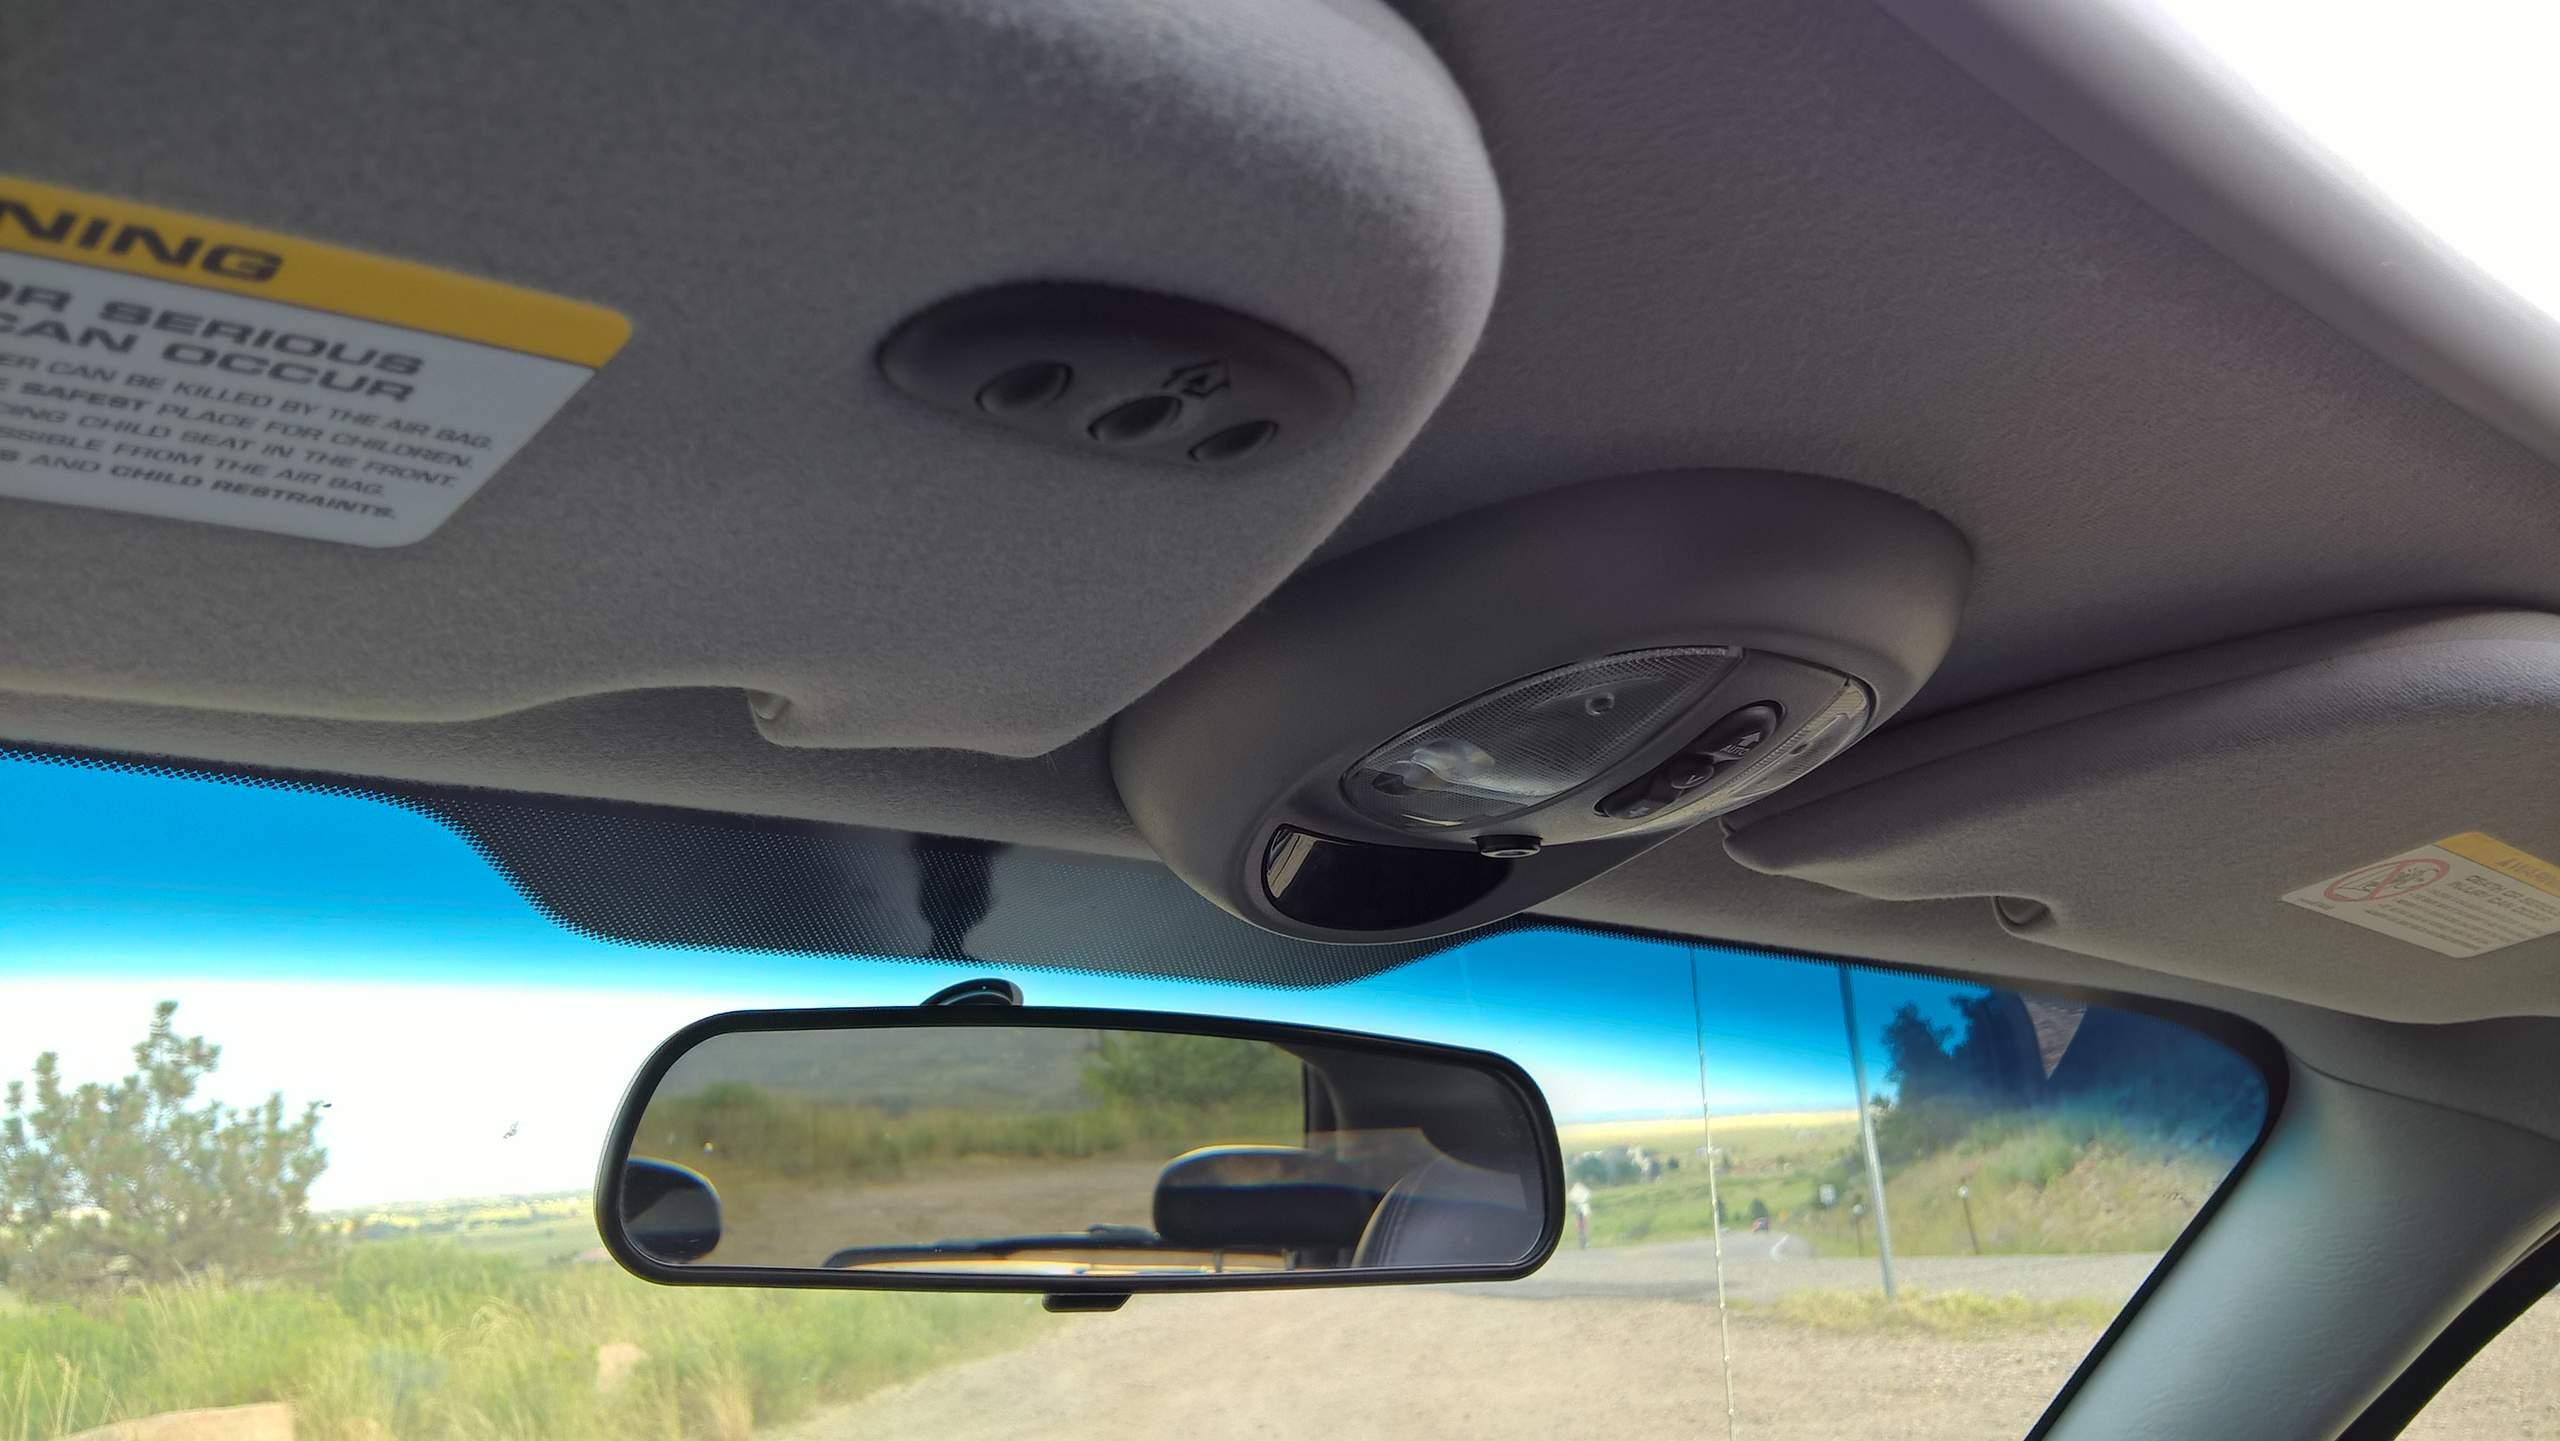 2005 chrysler pt cruiser gt remote garage door opener sunroof rear mirror 2005 pt cruiser gt rubansaba